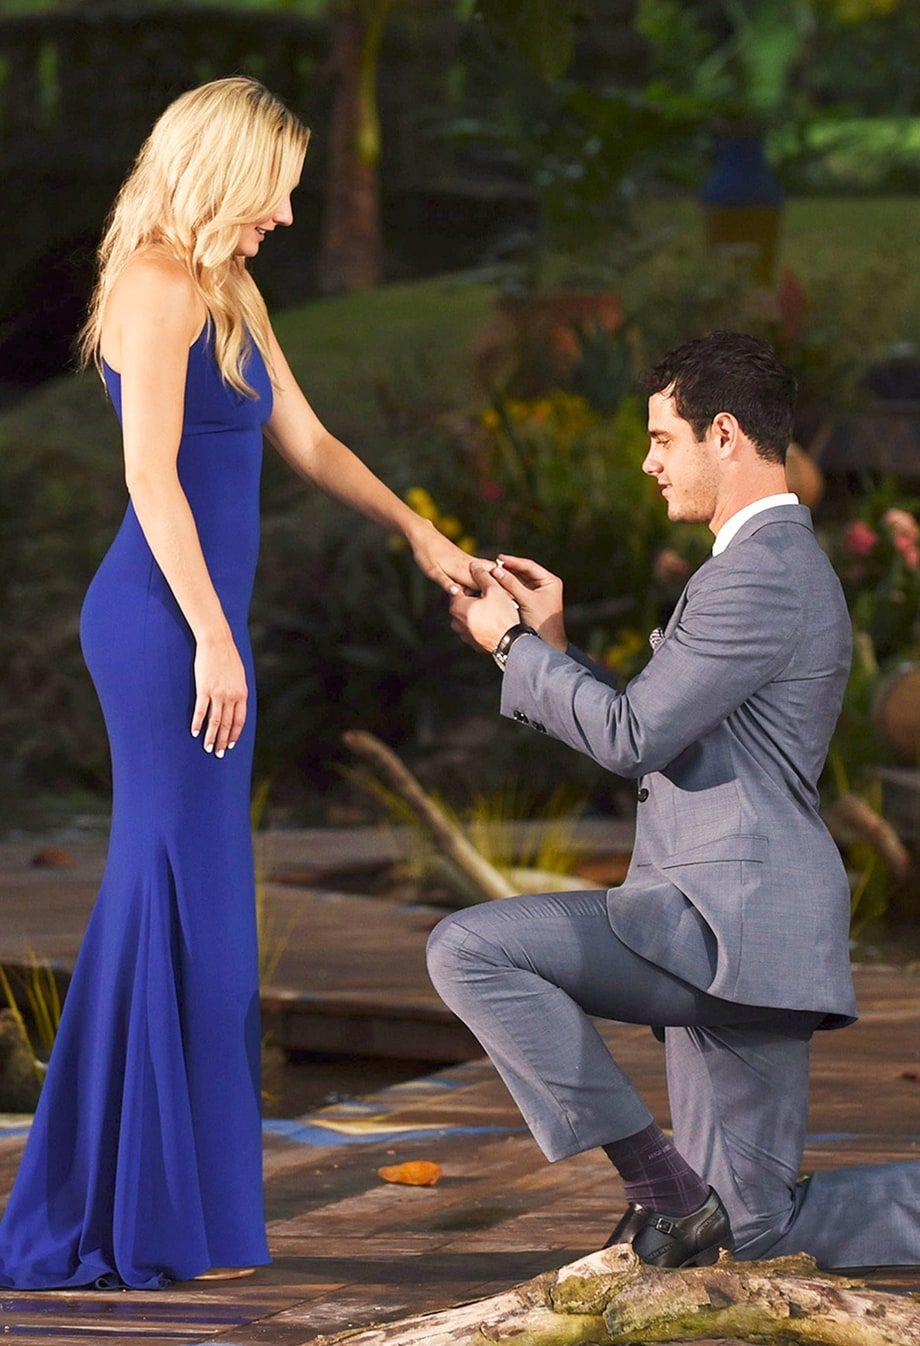 Bachelor Ben S 100k Diamond Engagement Ring All The Details Bachelorette Tops Ben And Lauren Celebrity Style